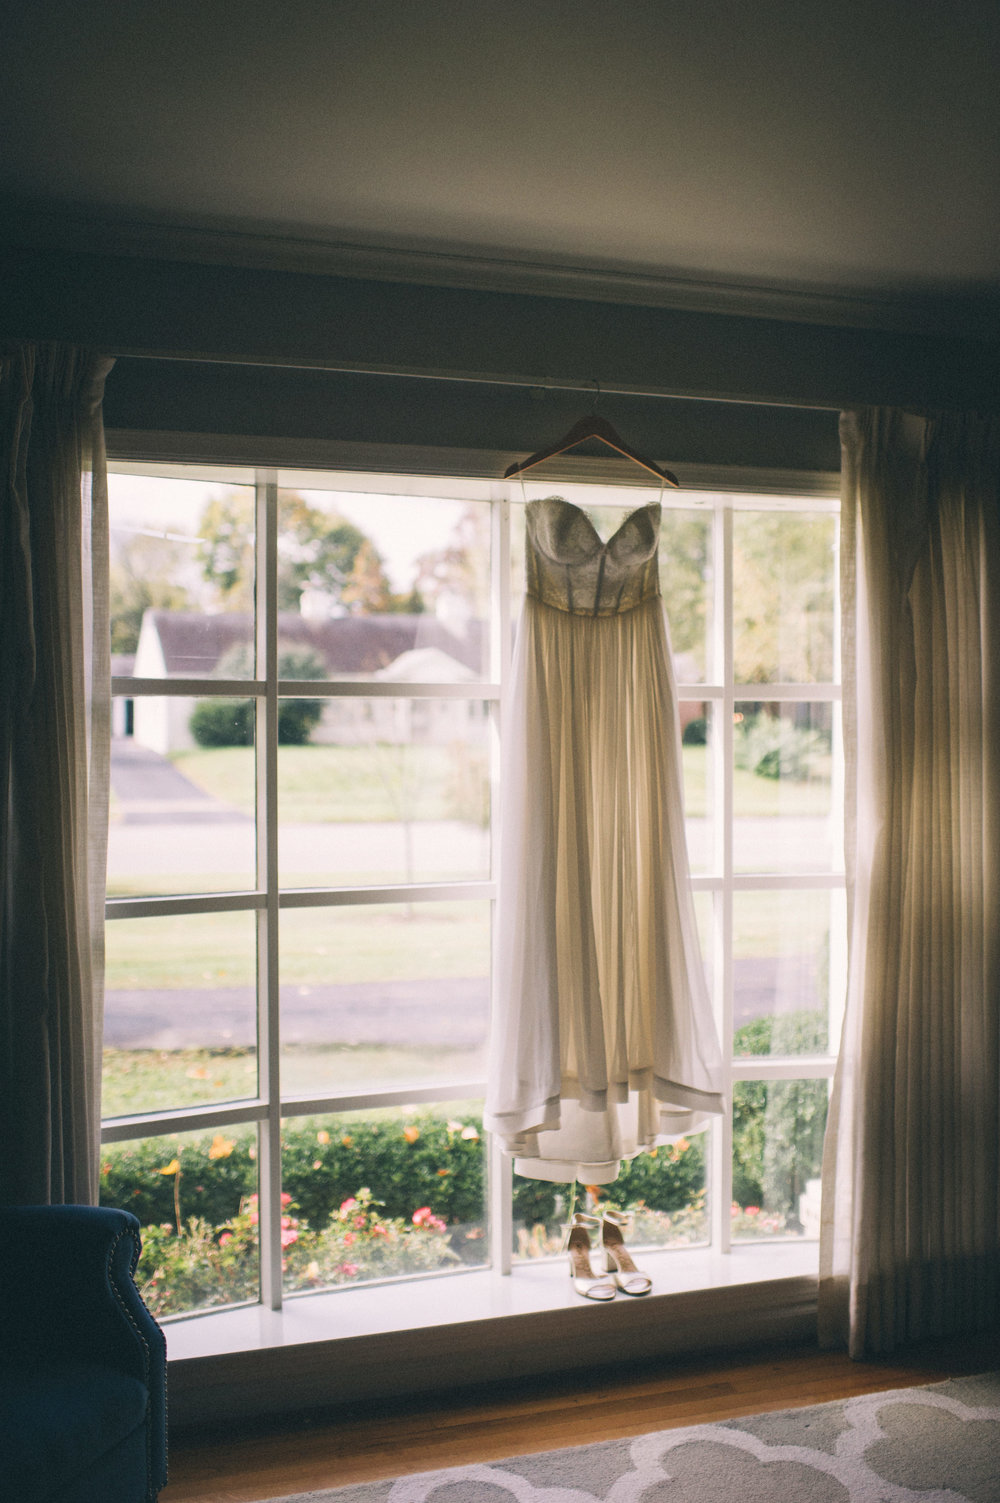 Micaha & Austin // Cozy Autumn Wedding at Springhouse Gardens // Lexington, Kentucky // Wedding Photography // Dress